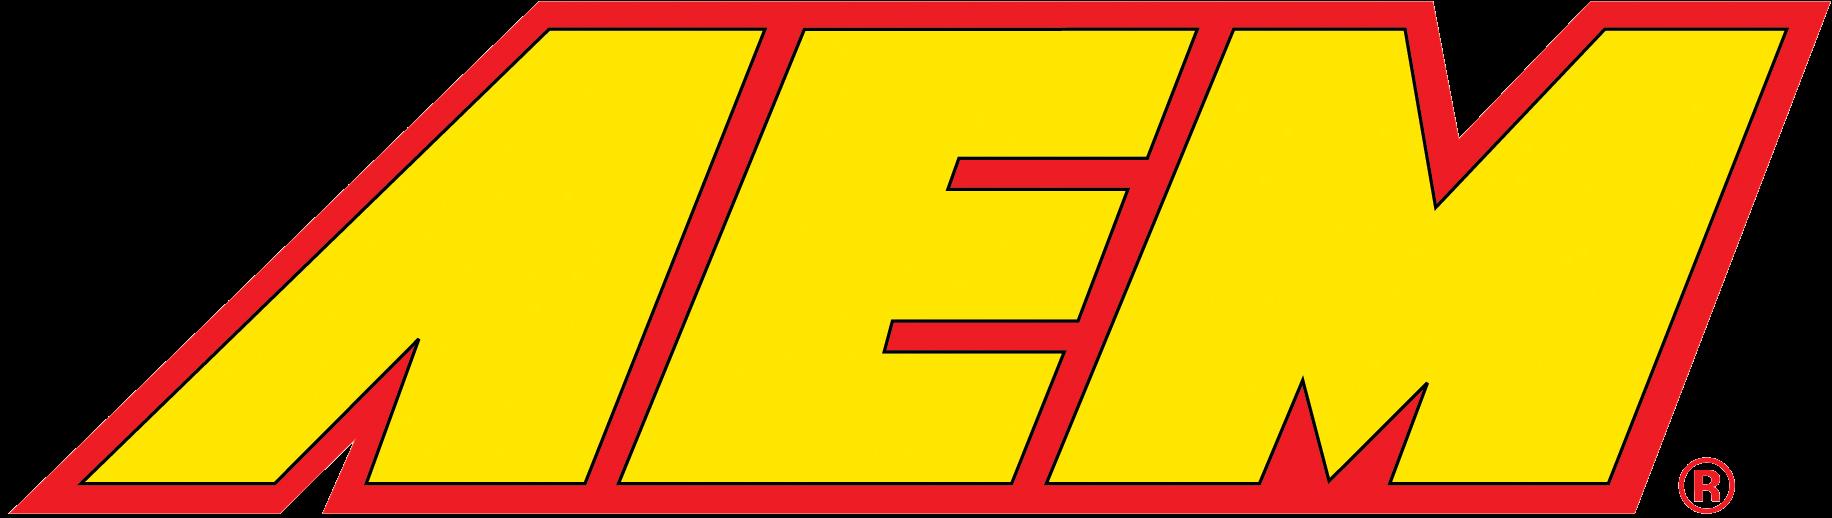 Image Aem Logo Png Hot Wheels Wiki Fandom Powered By